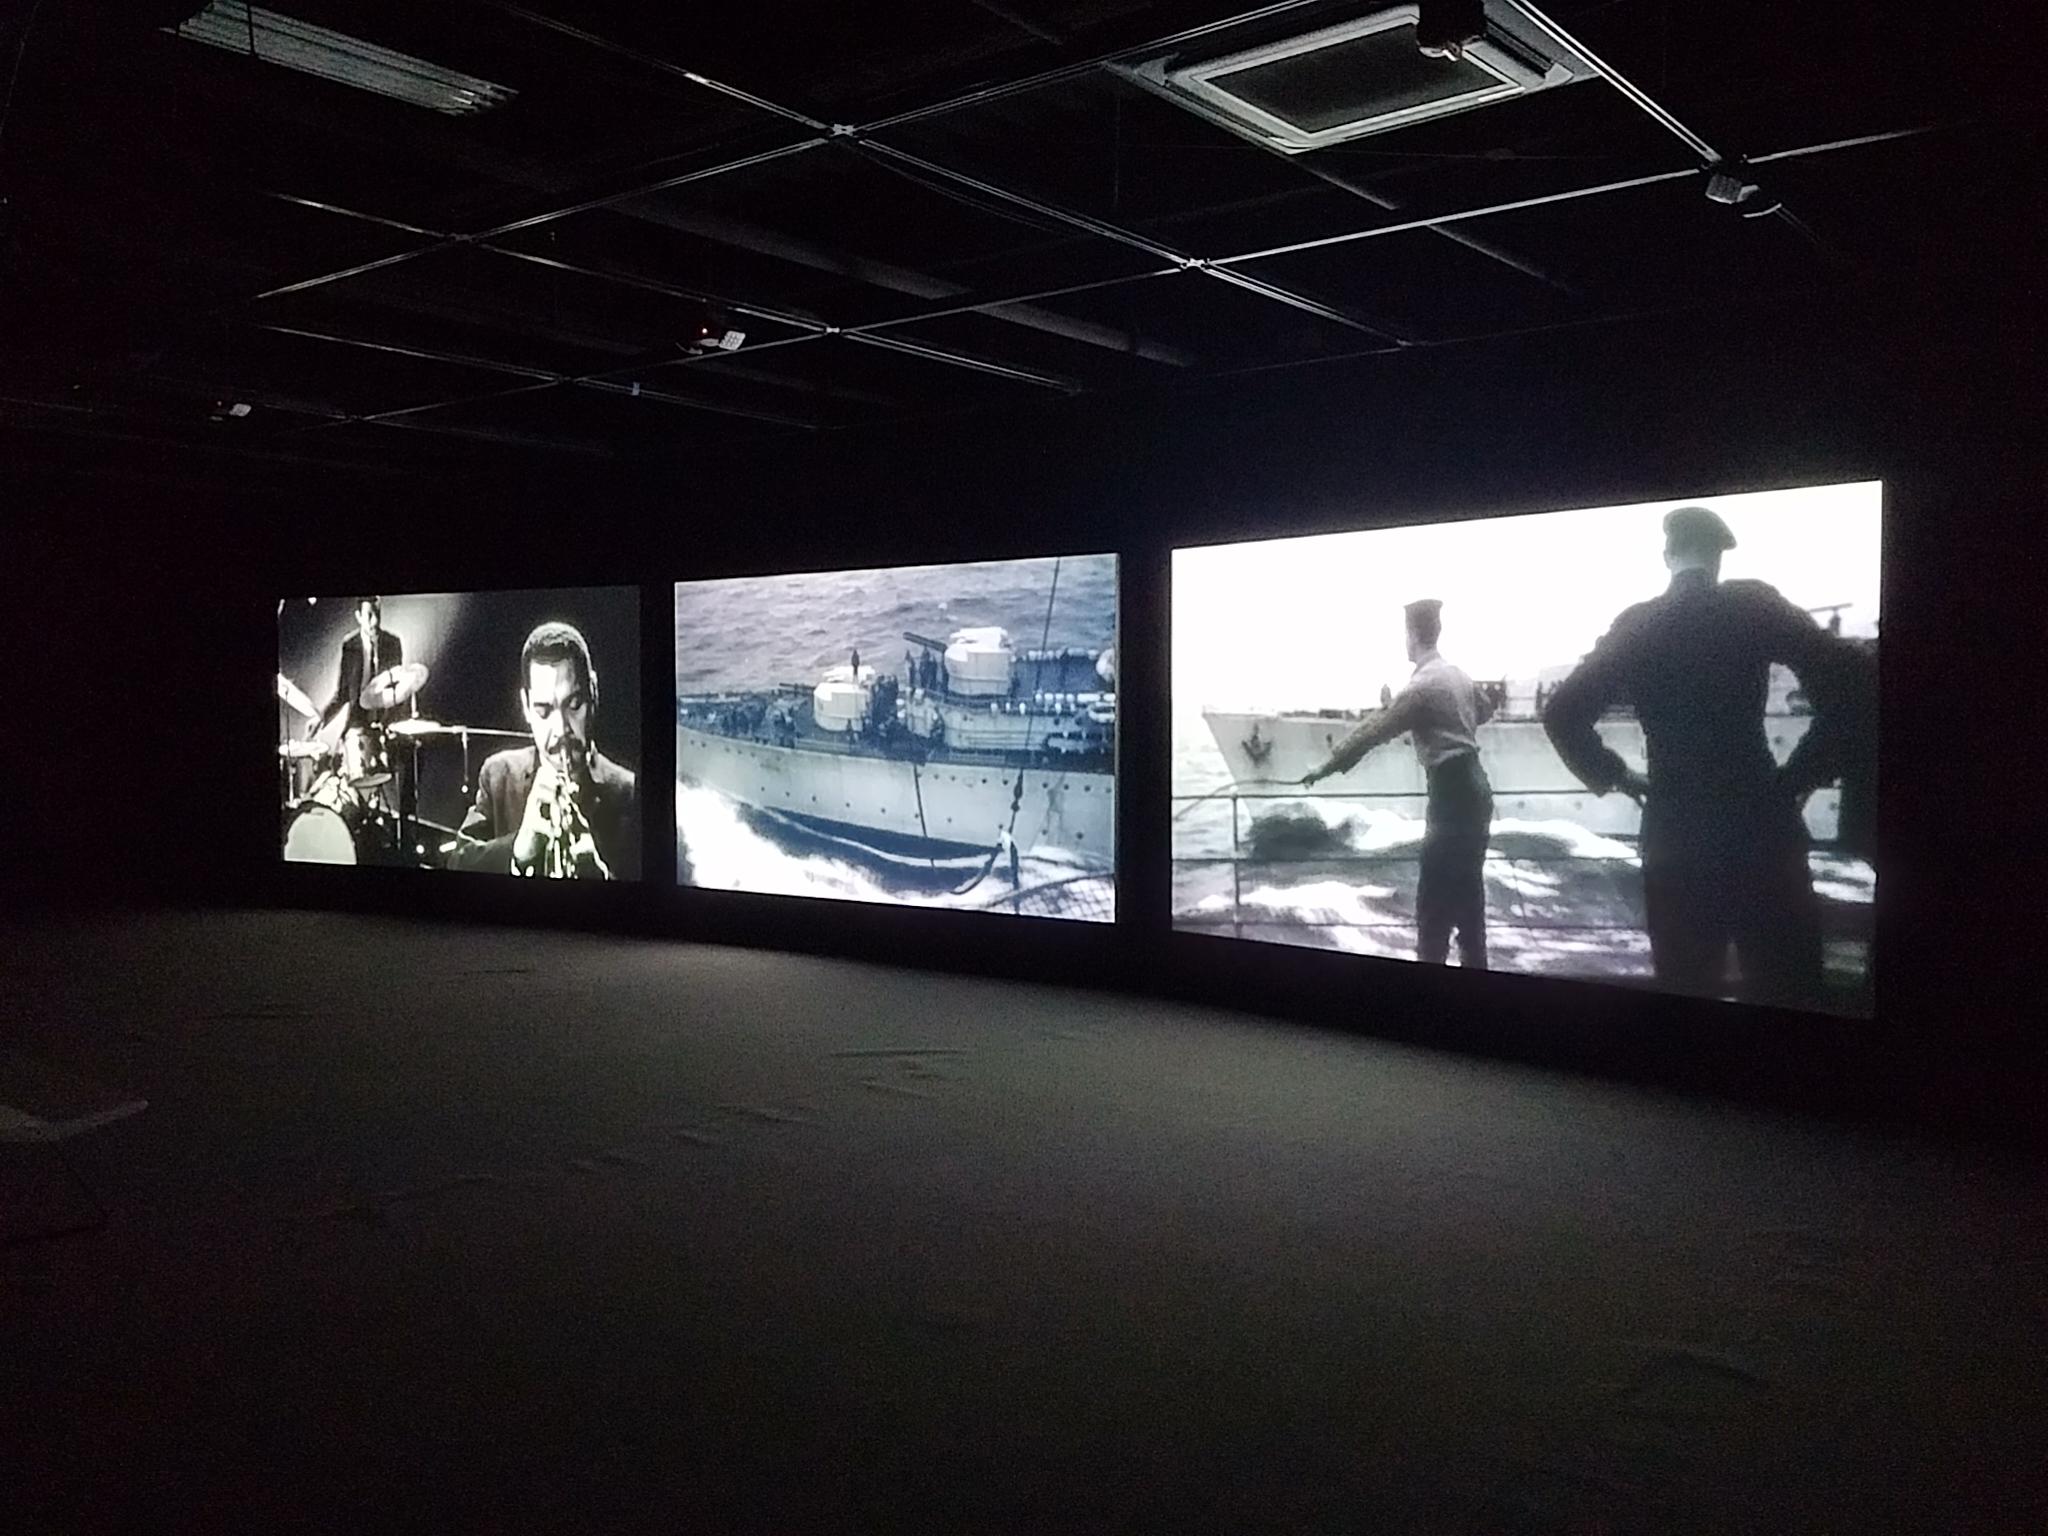 John Akomfrah's three-screen documentary highlighted the work of cultural theorist Stuart Hall.